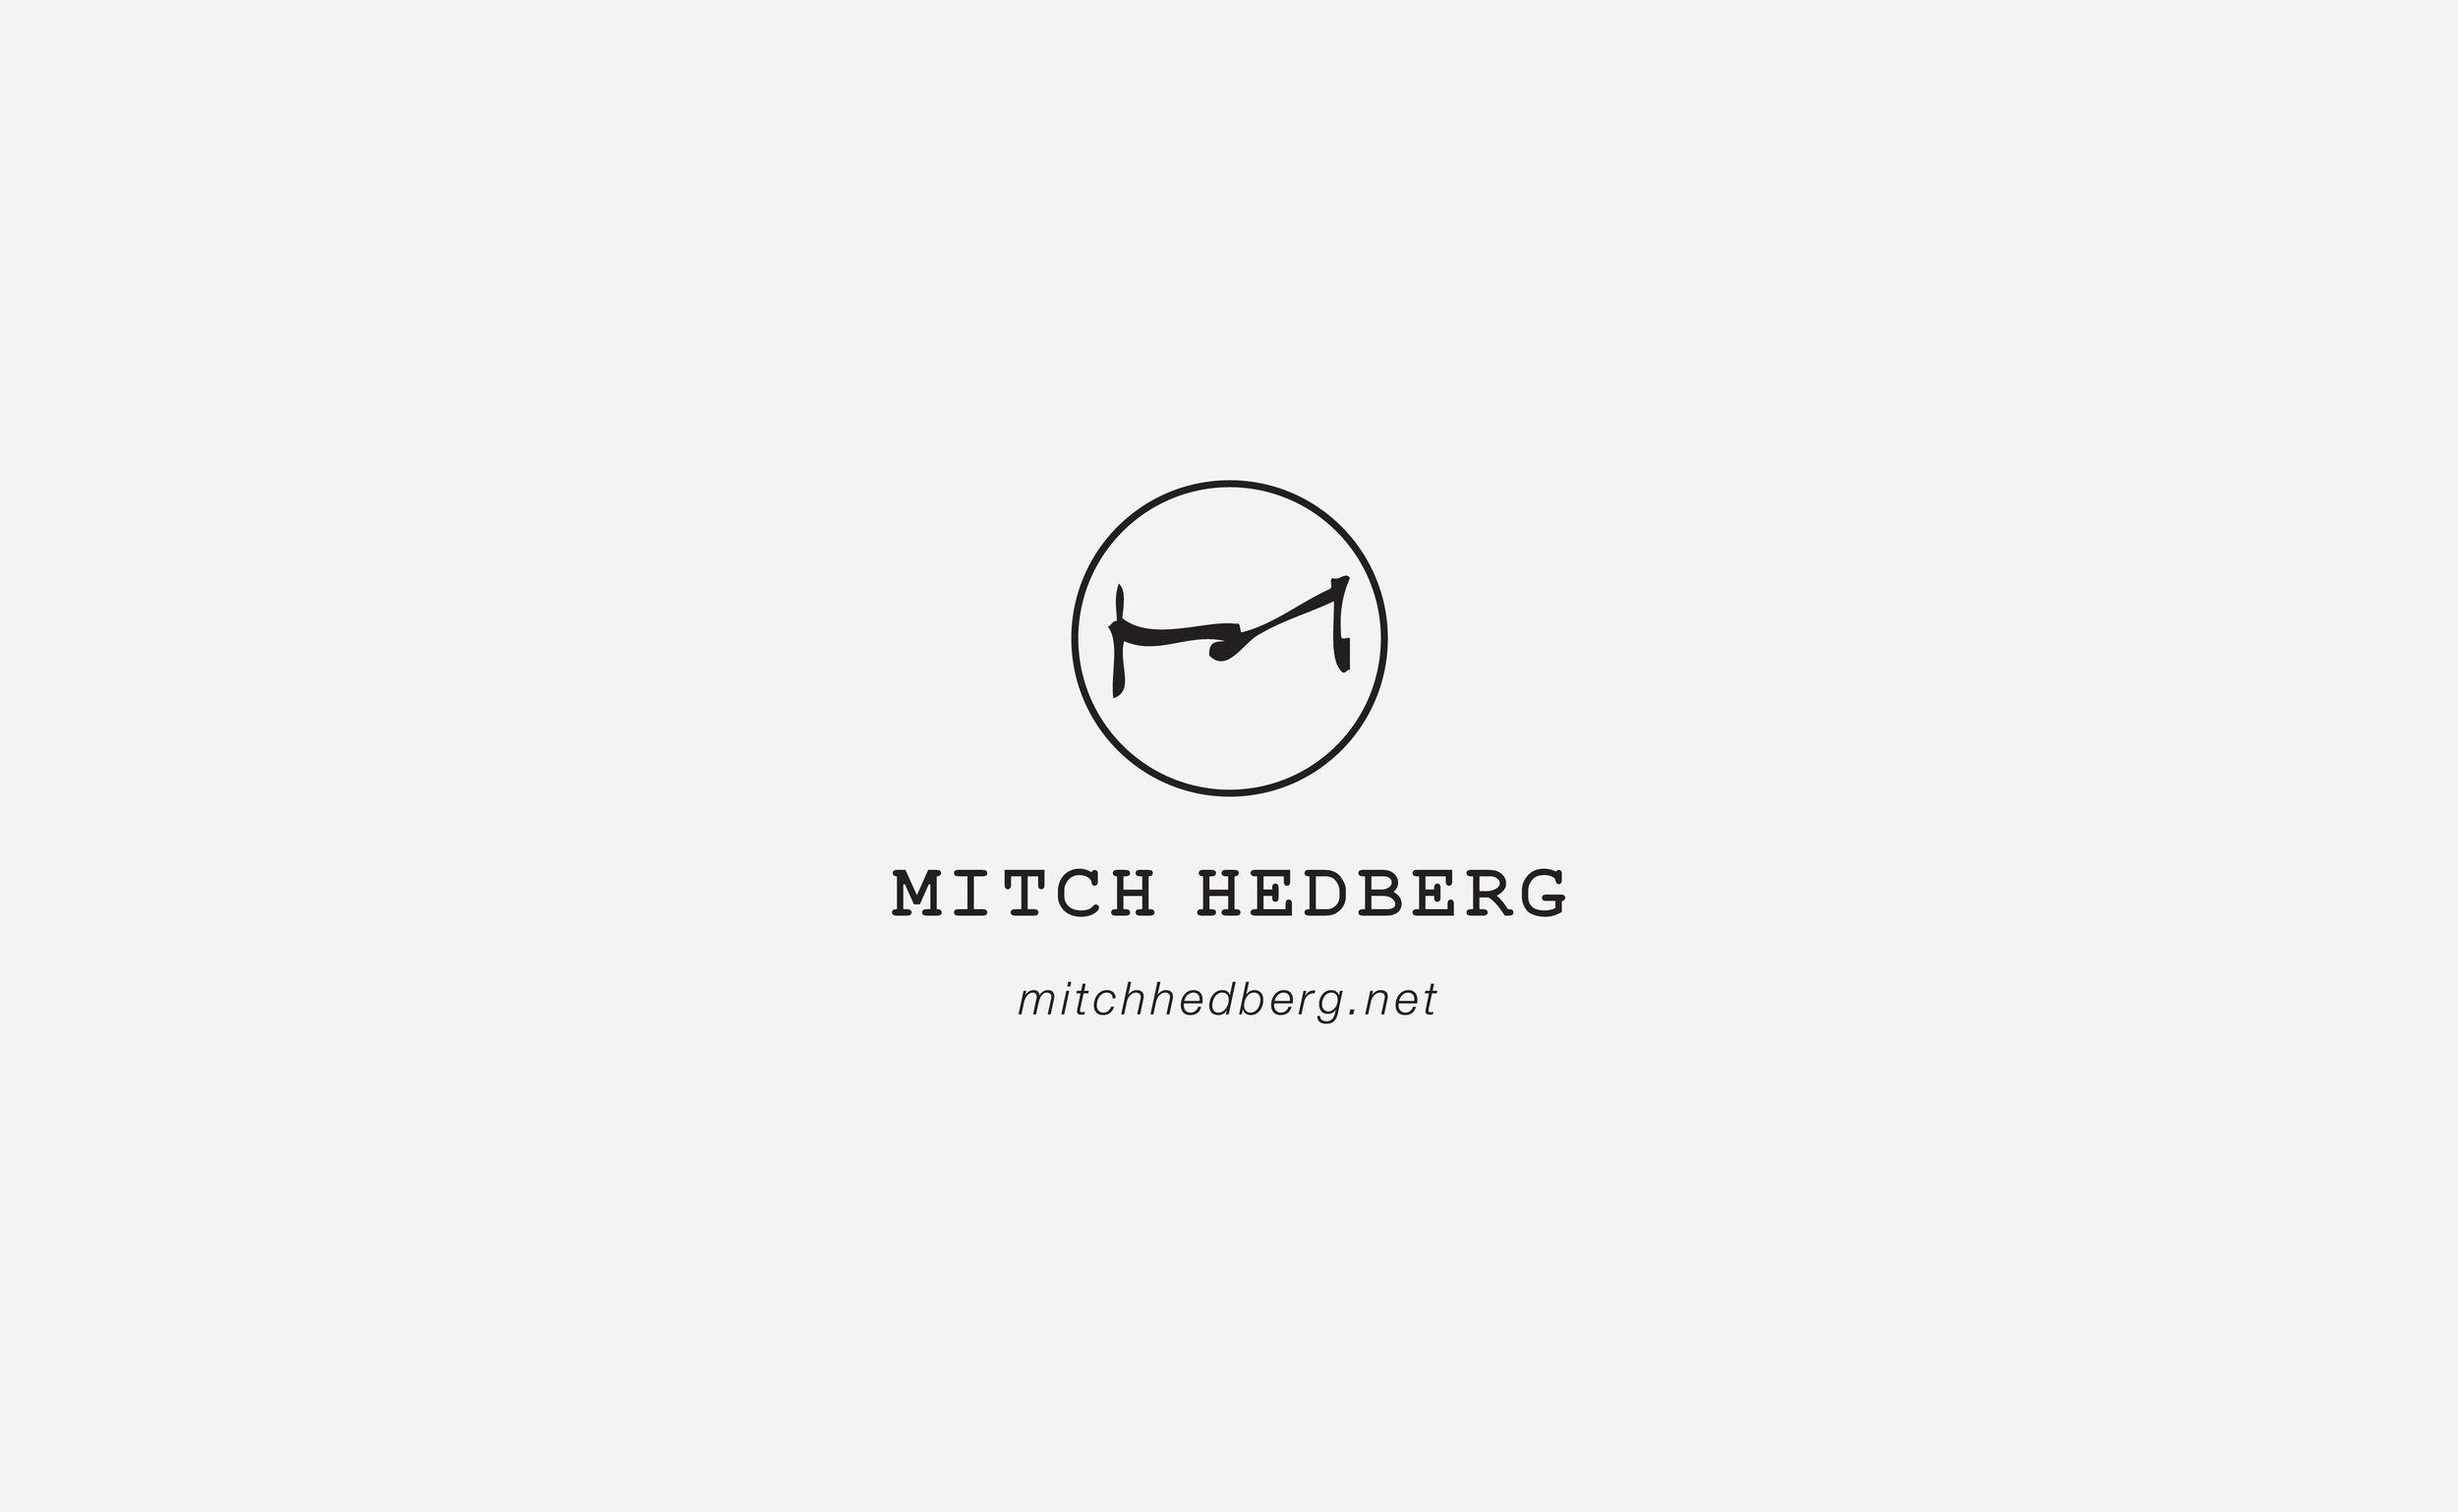 Mitch Hedberg: Comedian